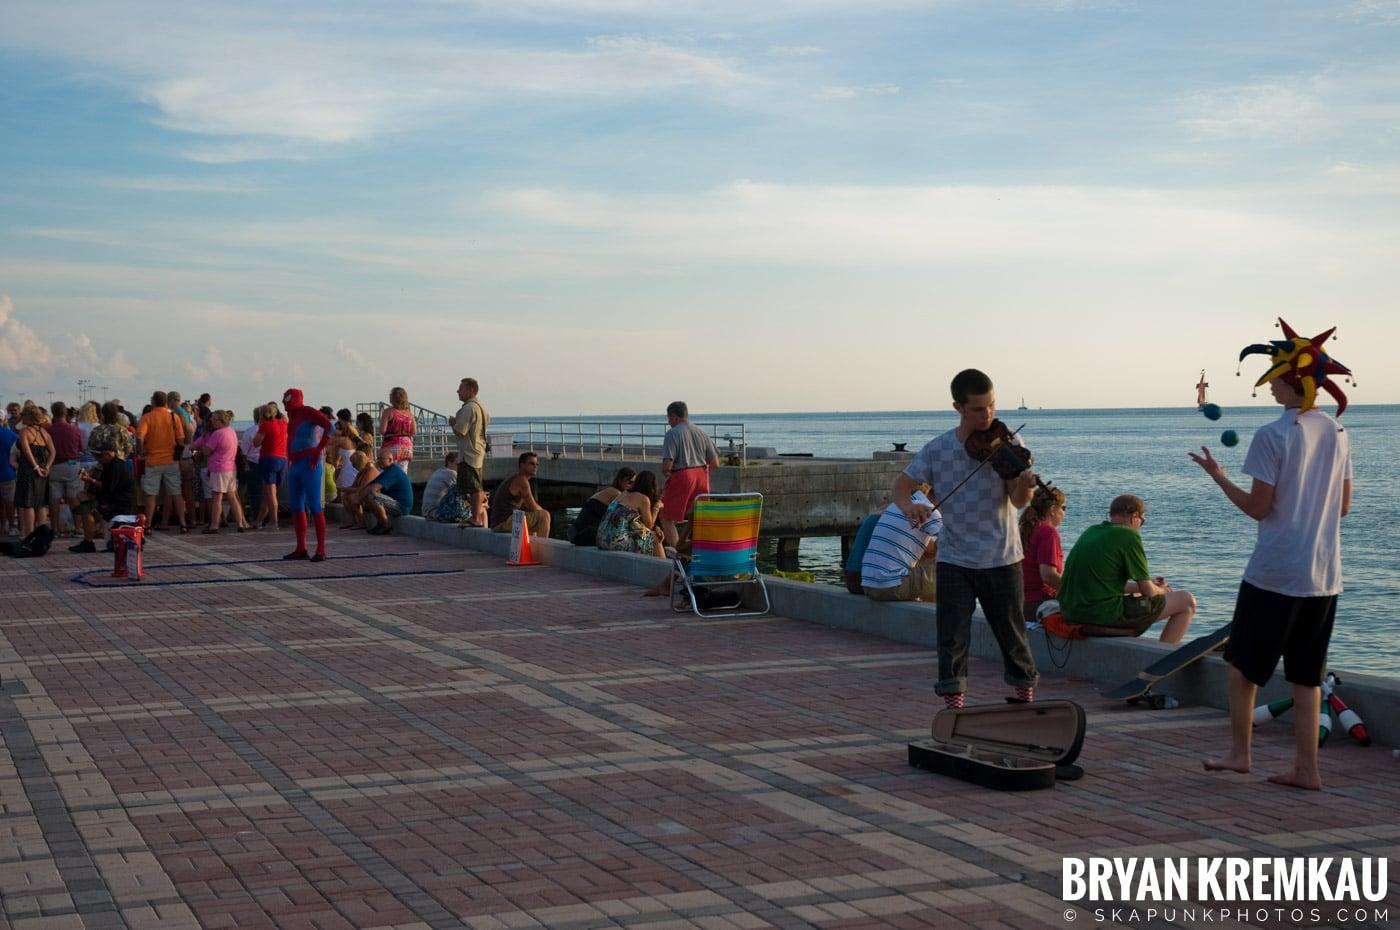 Florida Keys Vacation - 7.09.10 - 7.15.10 (30)